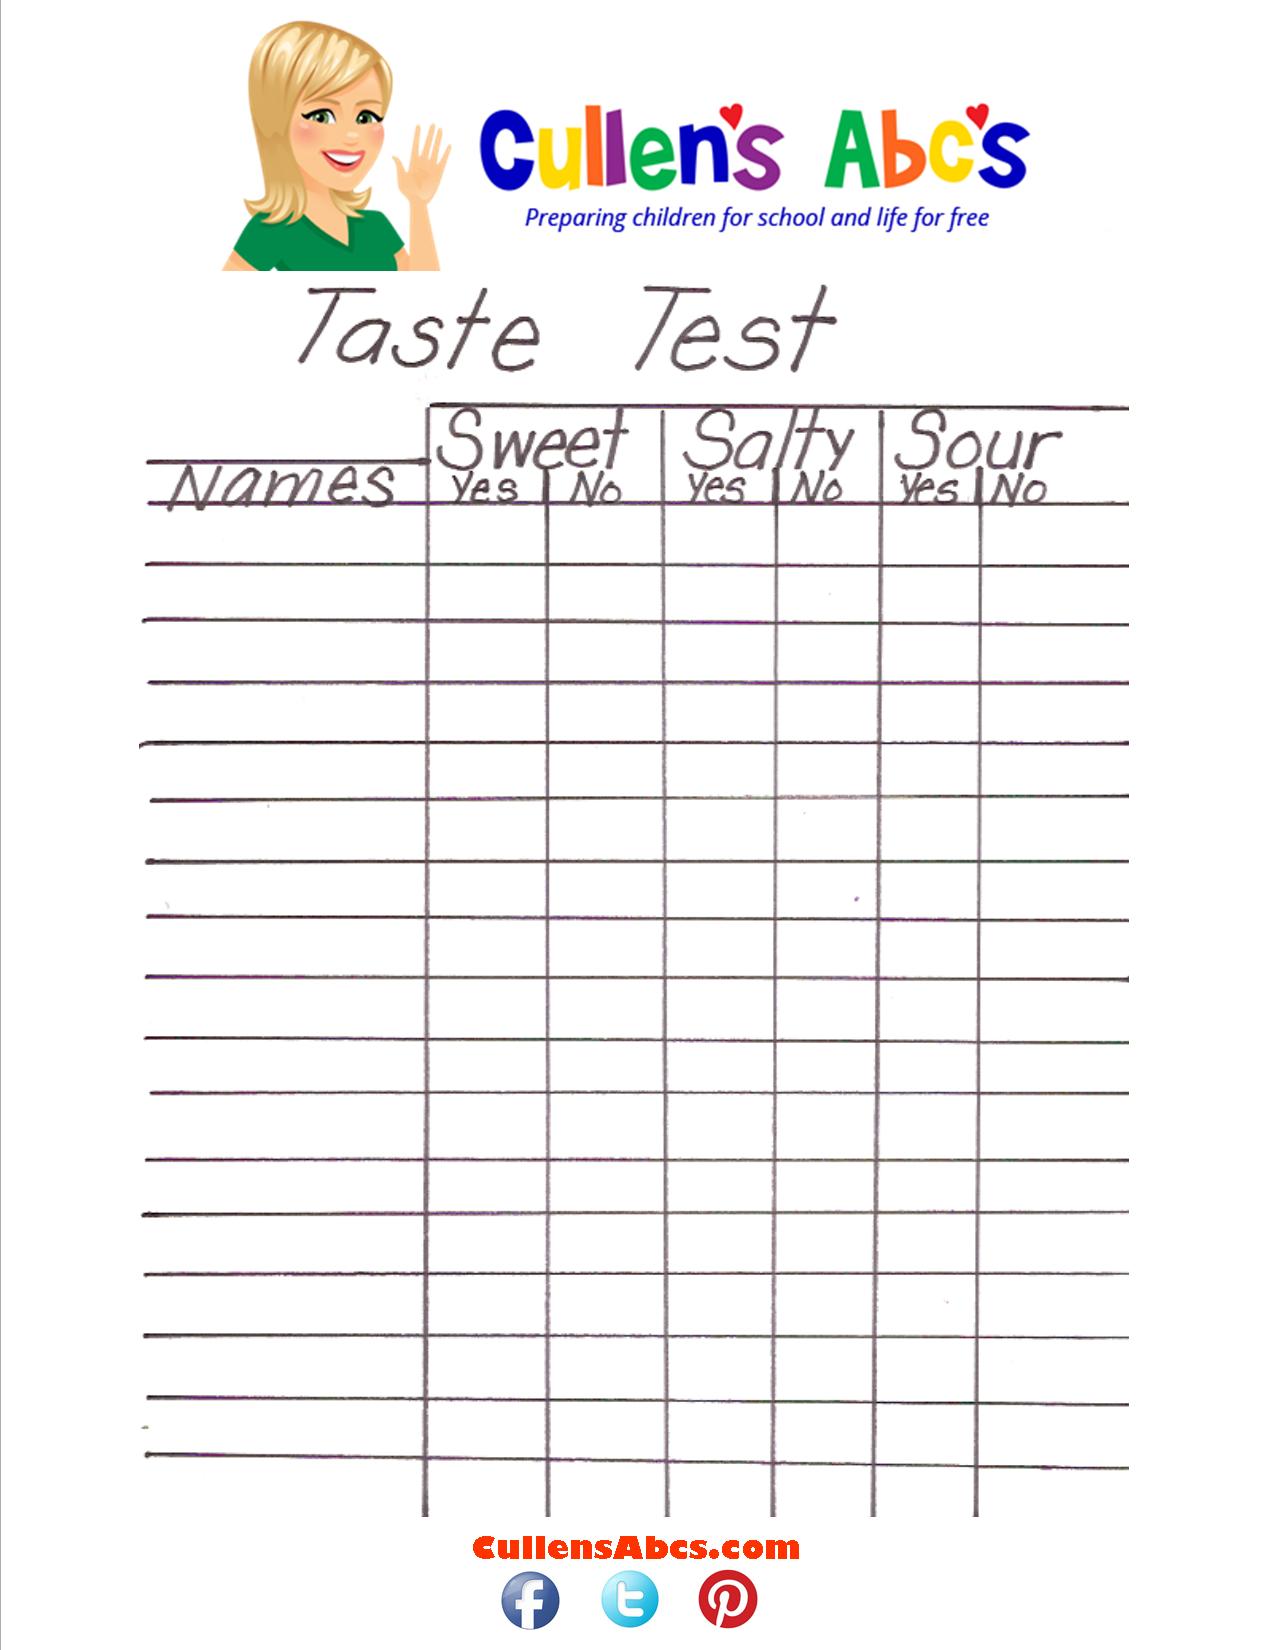 Taste Test Chart